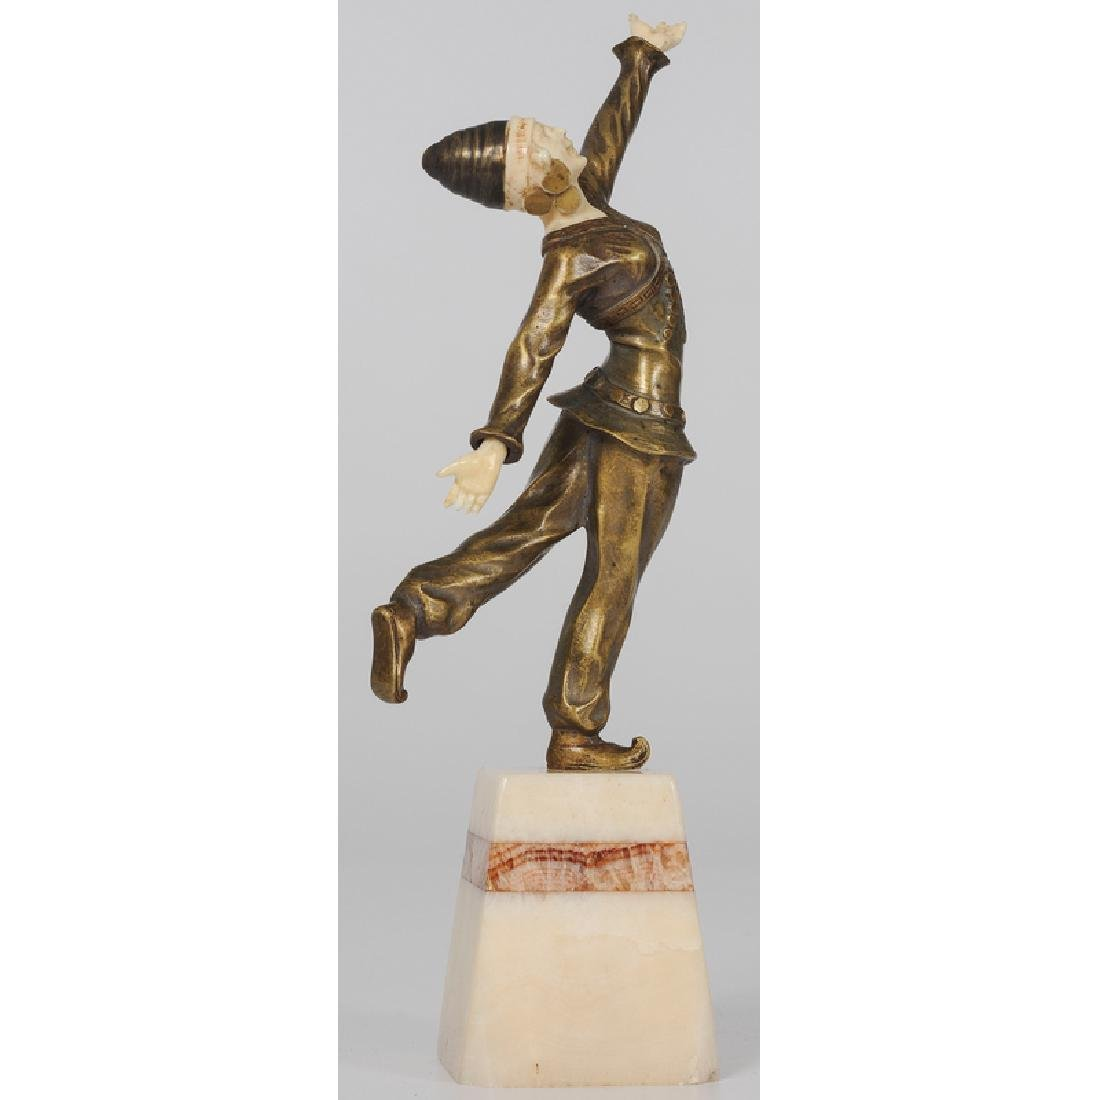 Ivory and Bronze Sculpture Signed Solange Bertrand